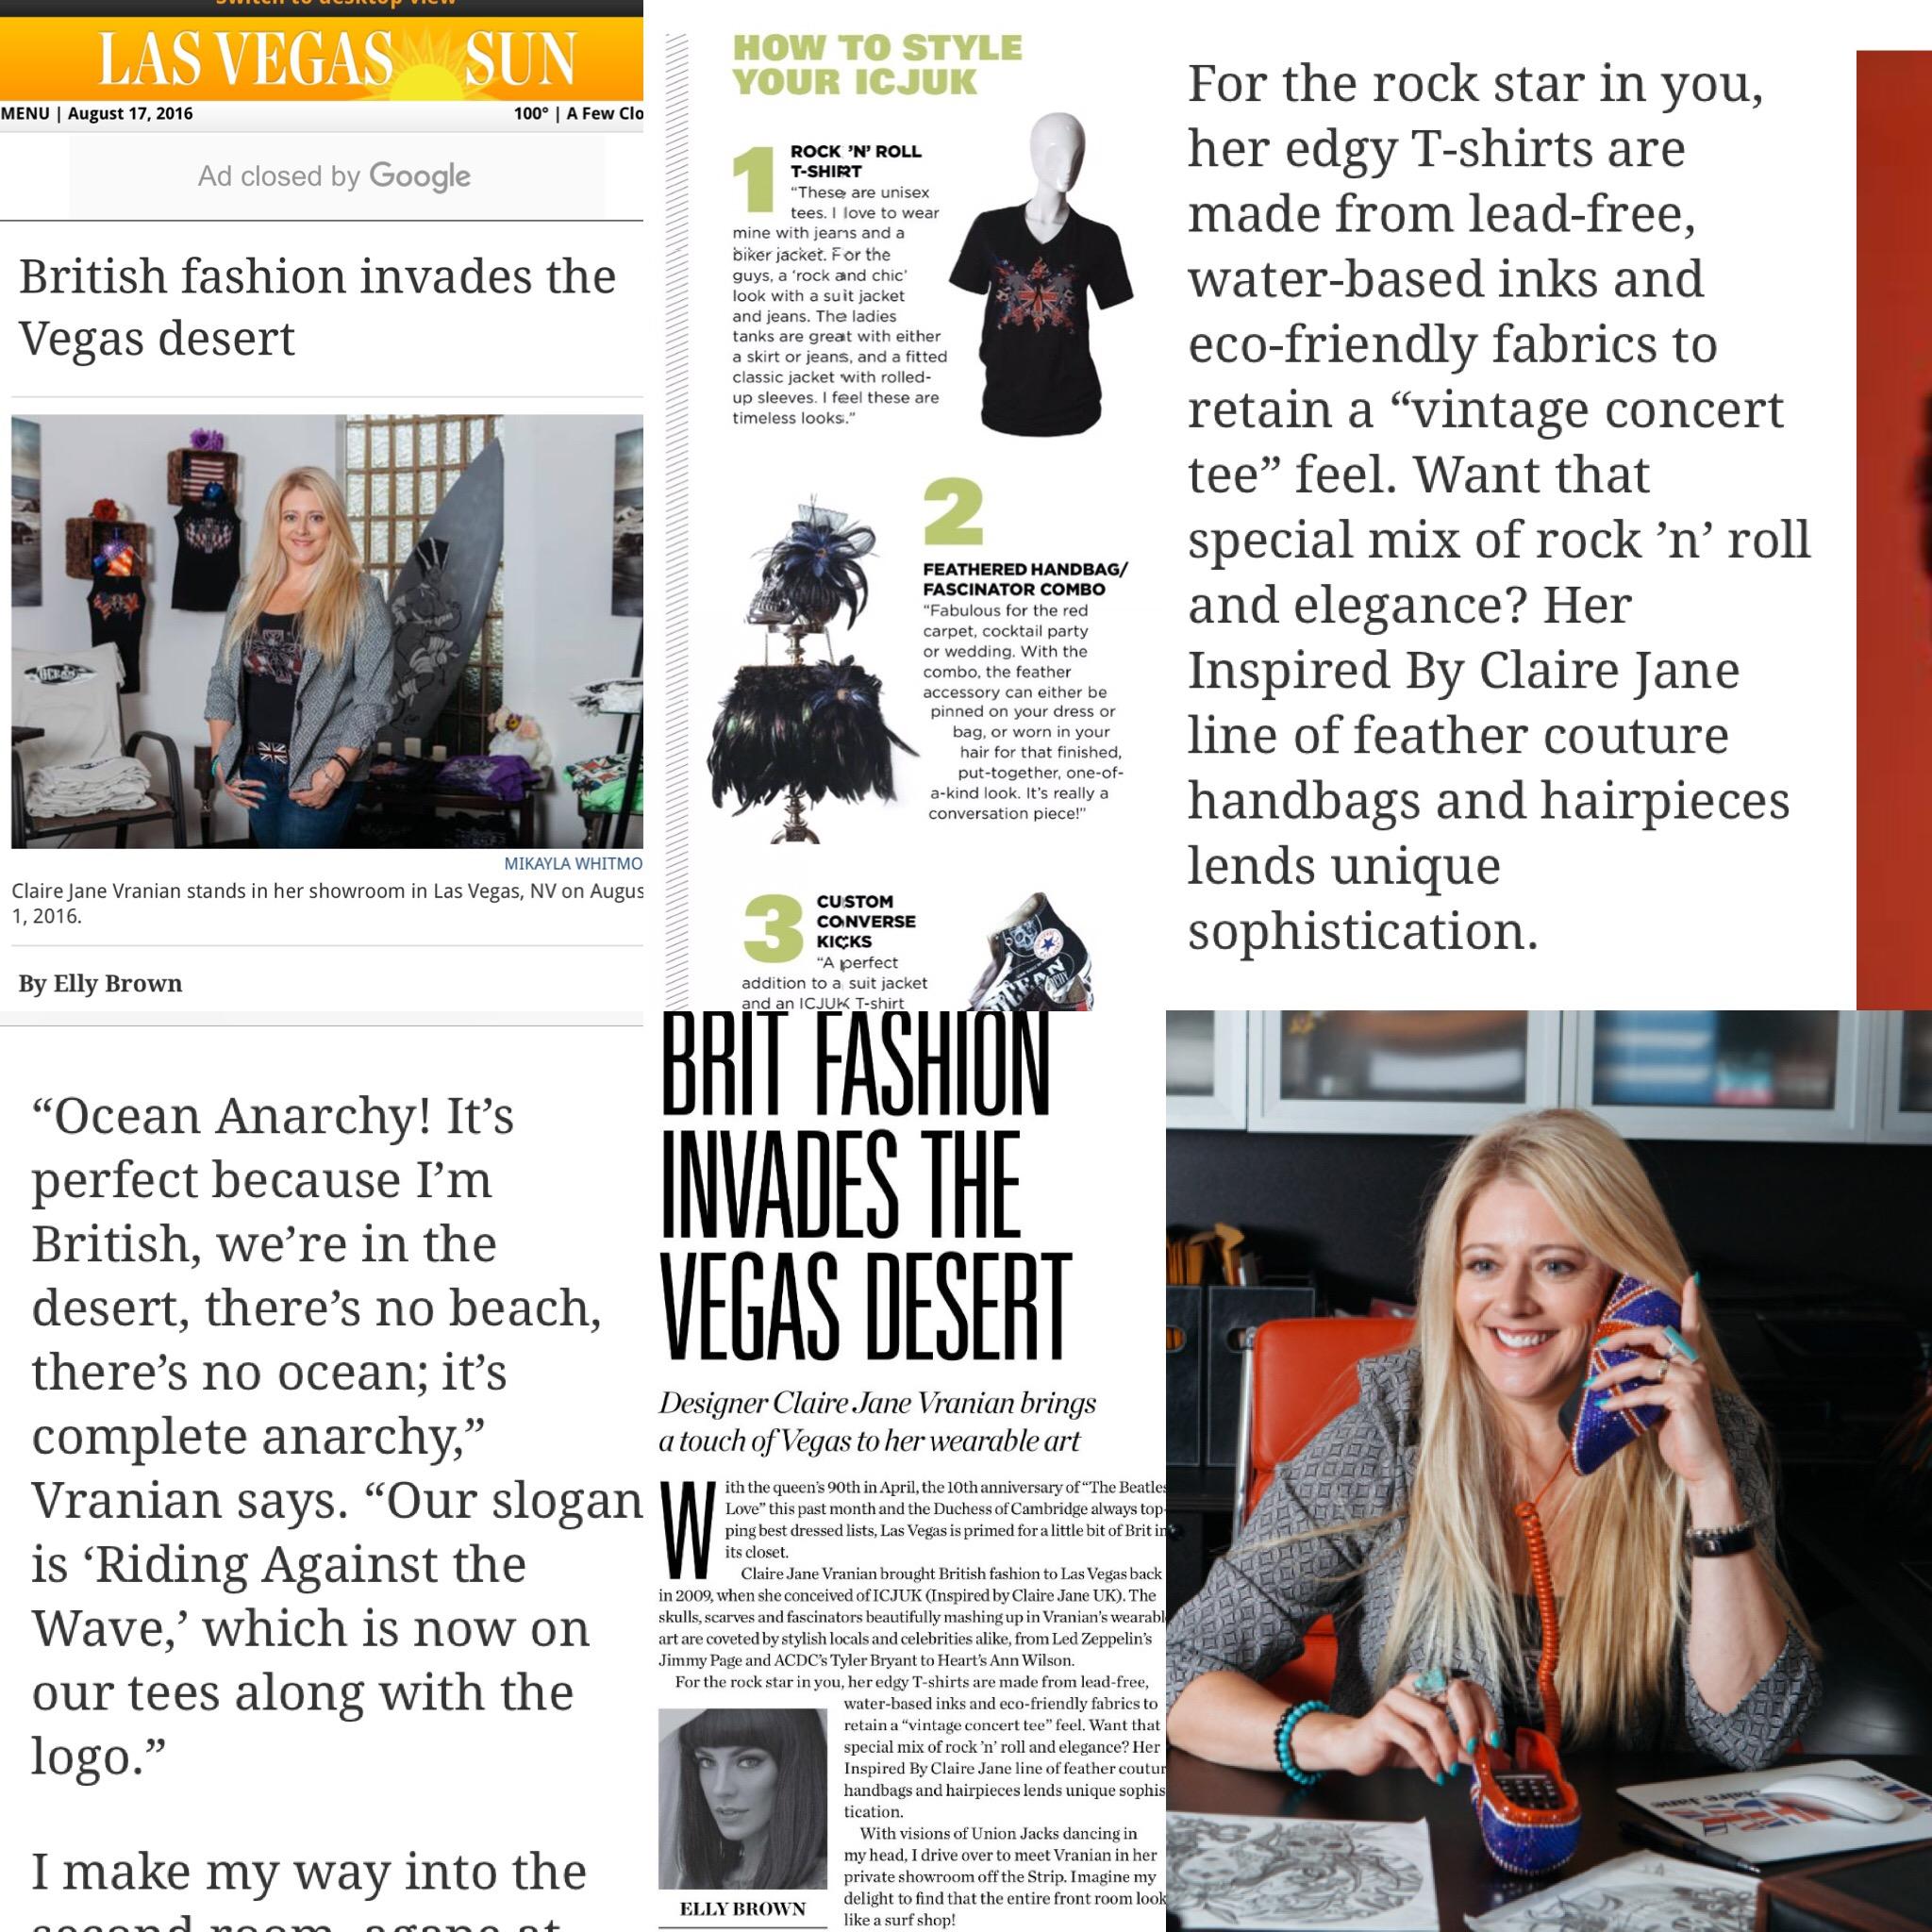 Claire Jane Press The Sun Online Aug 2016